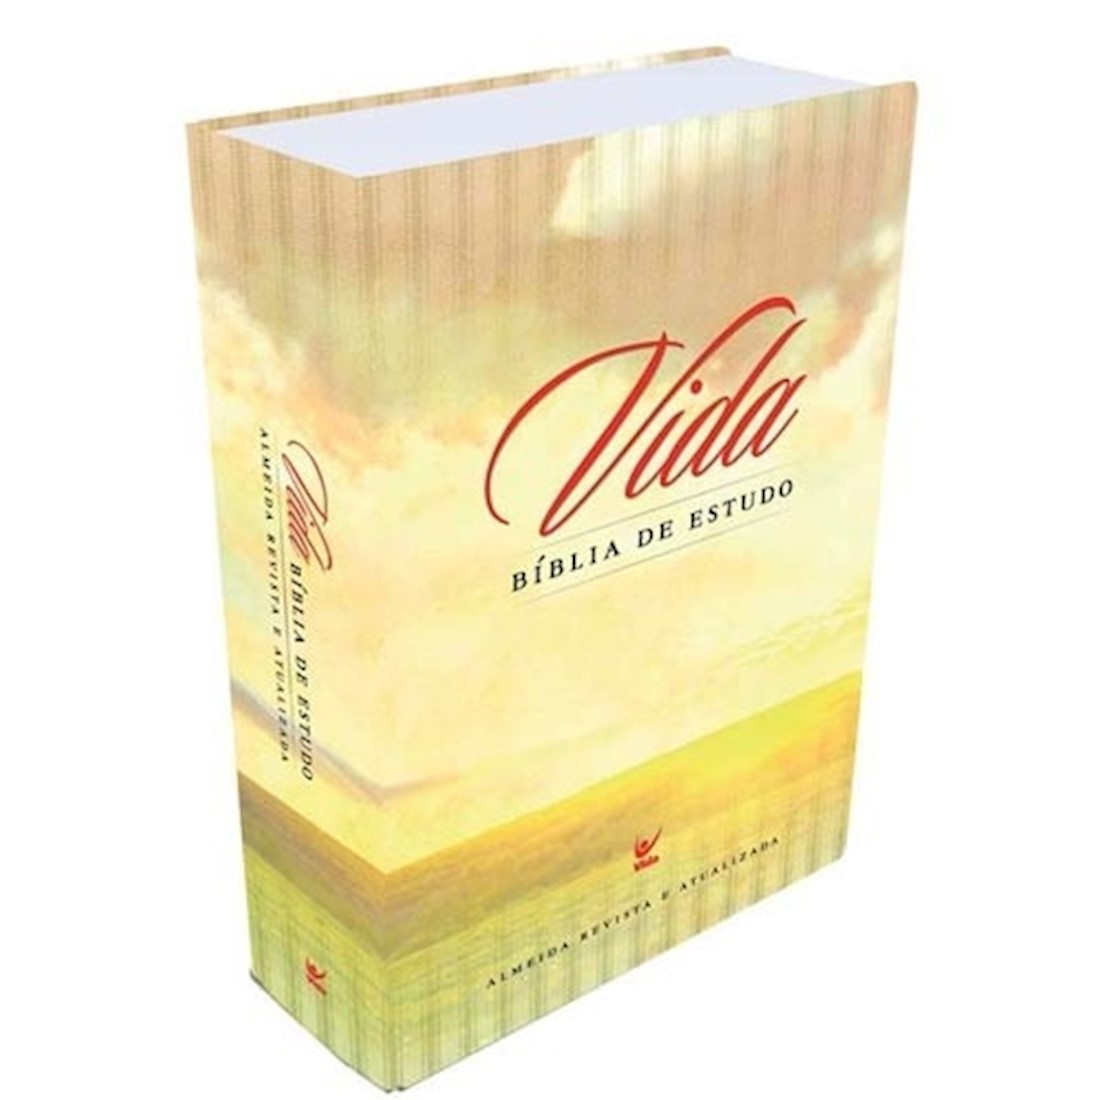 Bíblia de Estudo Vida - Capa Dura